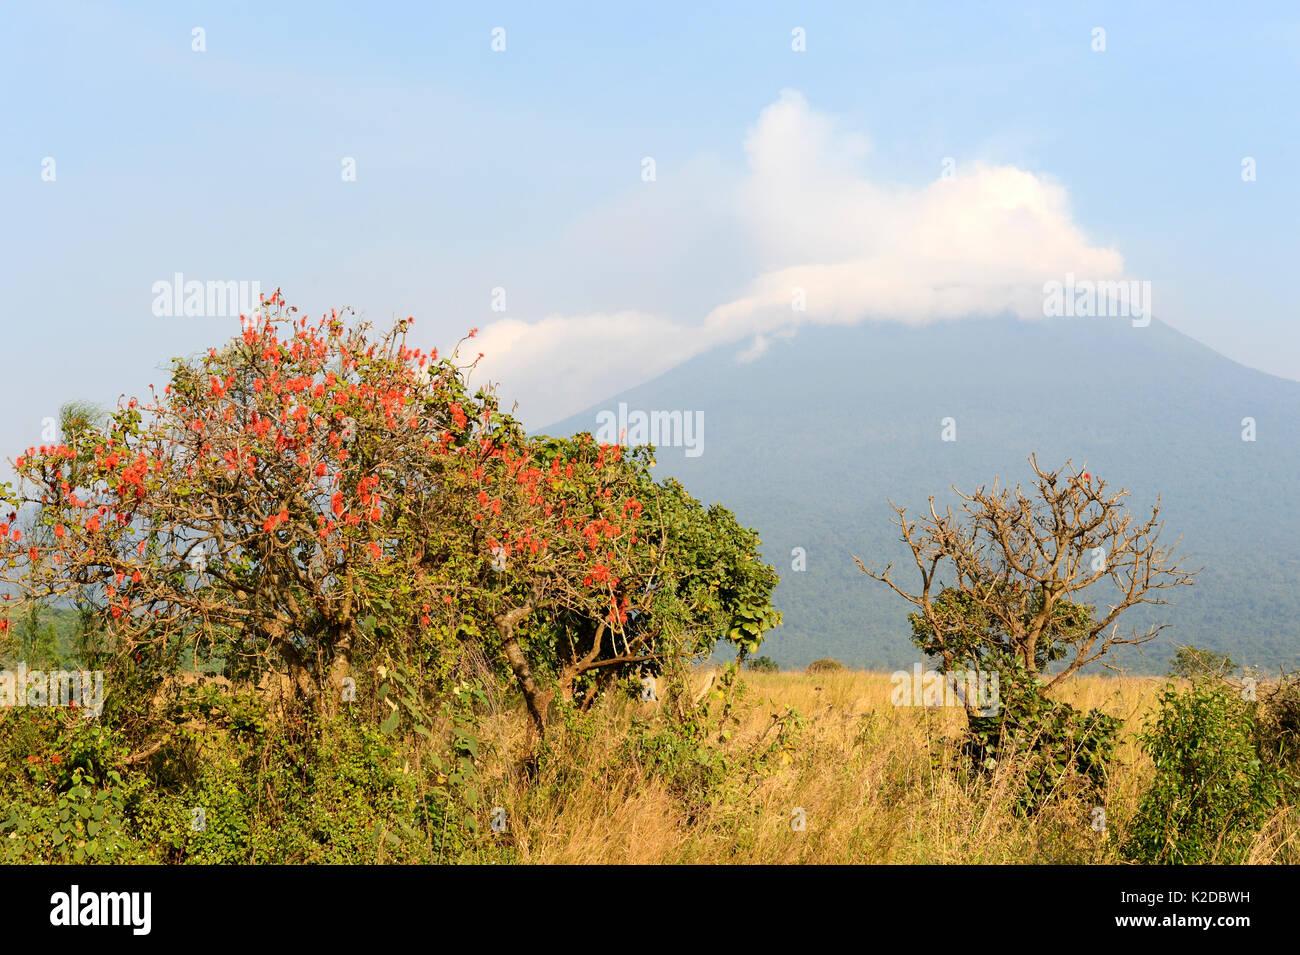 Mount Nyiragongo  smoking -  one of several active volcanoes in the Virunga Massif Volcano Range, Democratic Republic of Congo, Africa. July 2016 - Stock Image